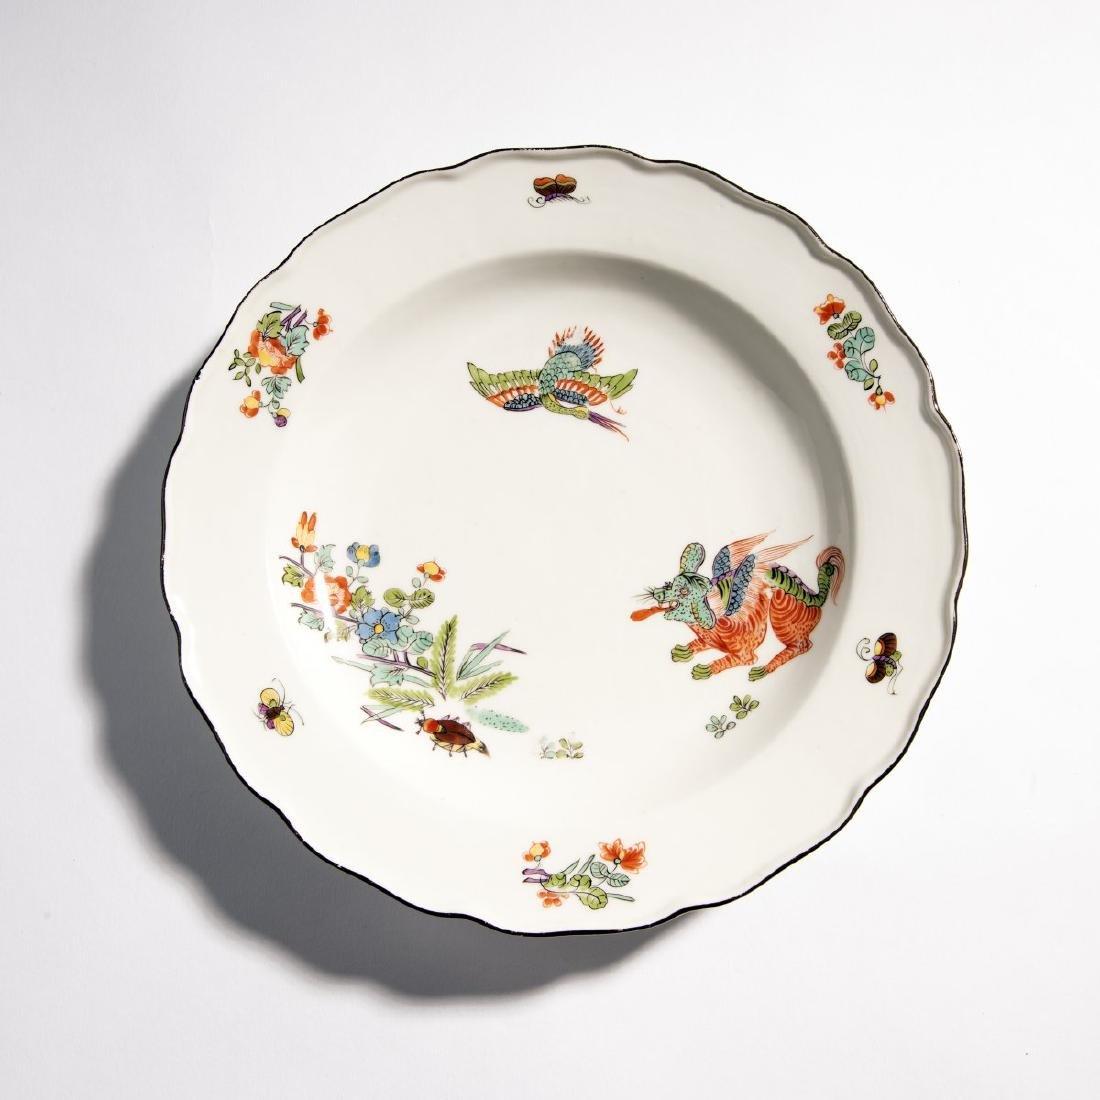 KPM Meissen, Soup plate 'Flying Dog', c. 1730